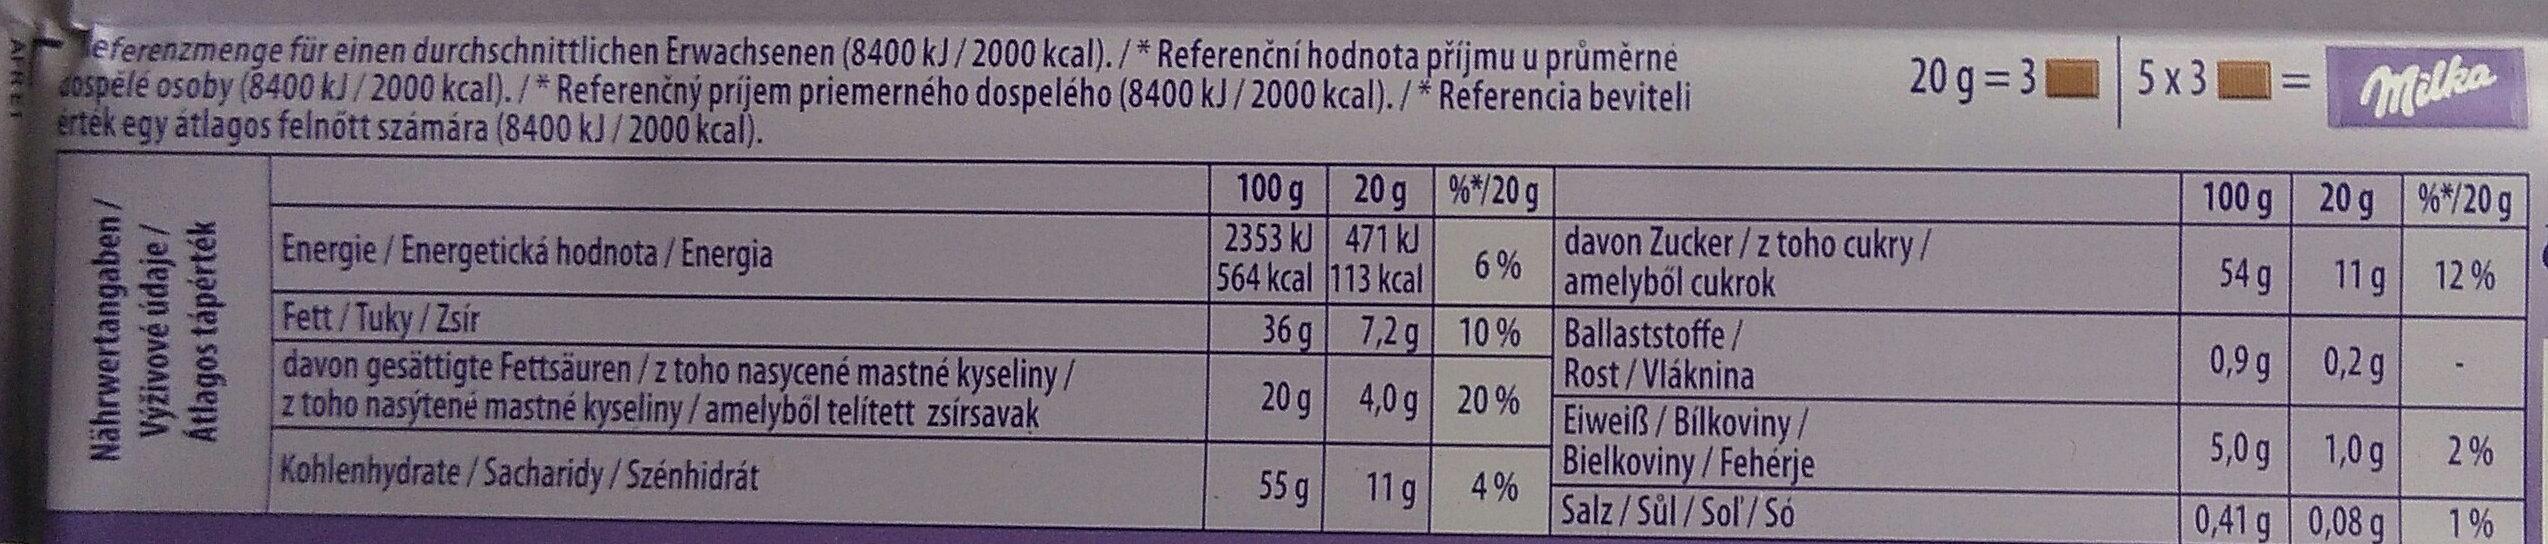 Milka Joghurt - Nährwertangaben - de